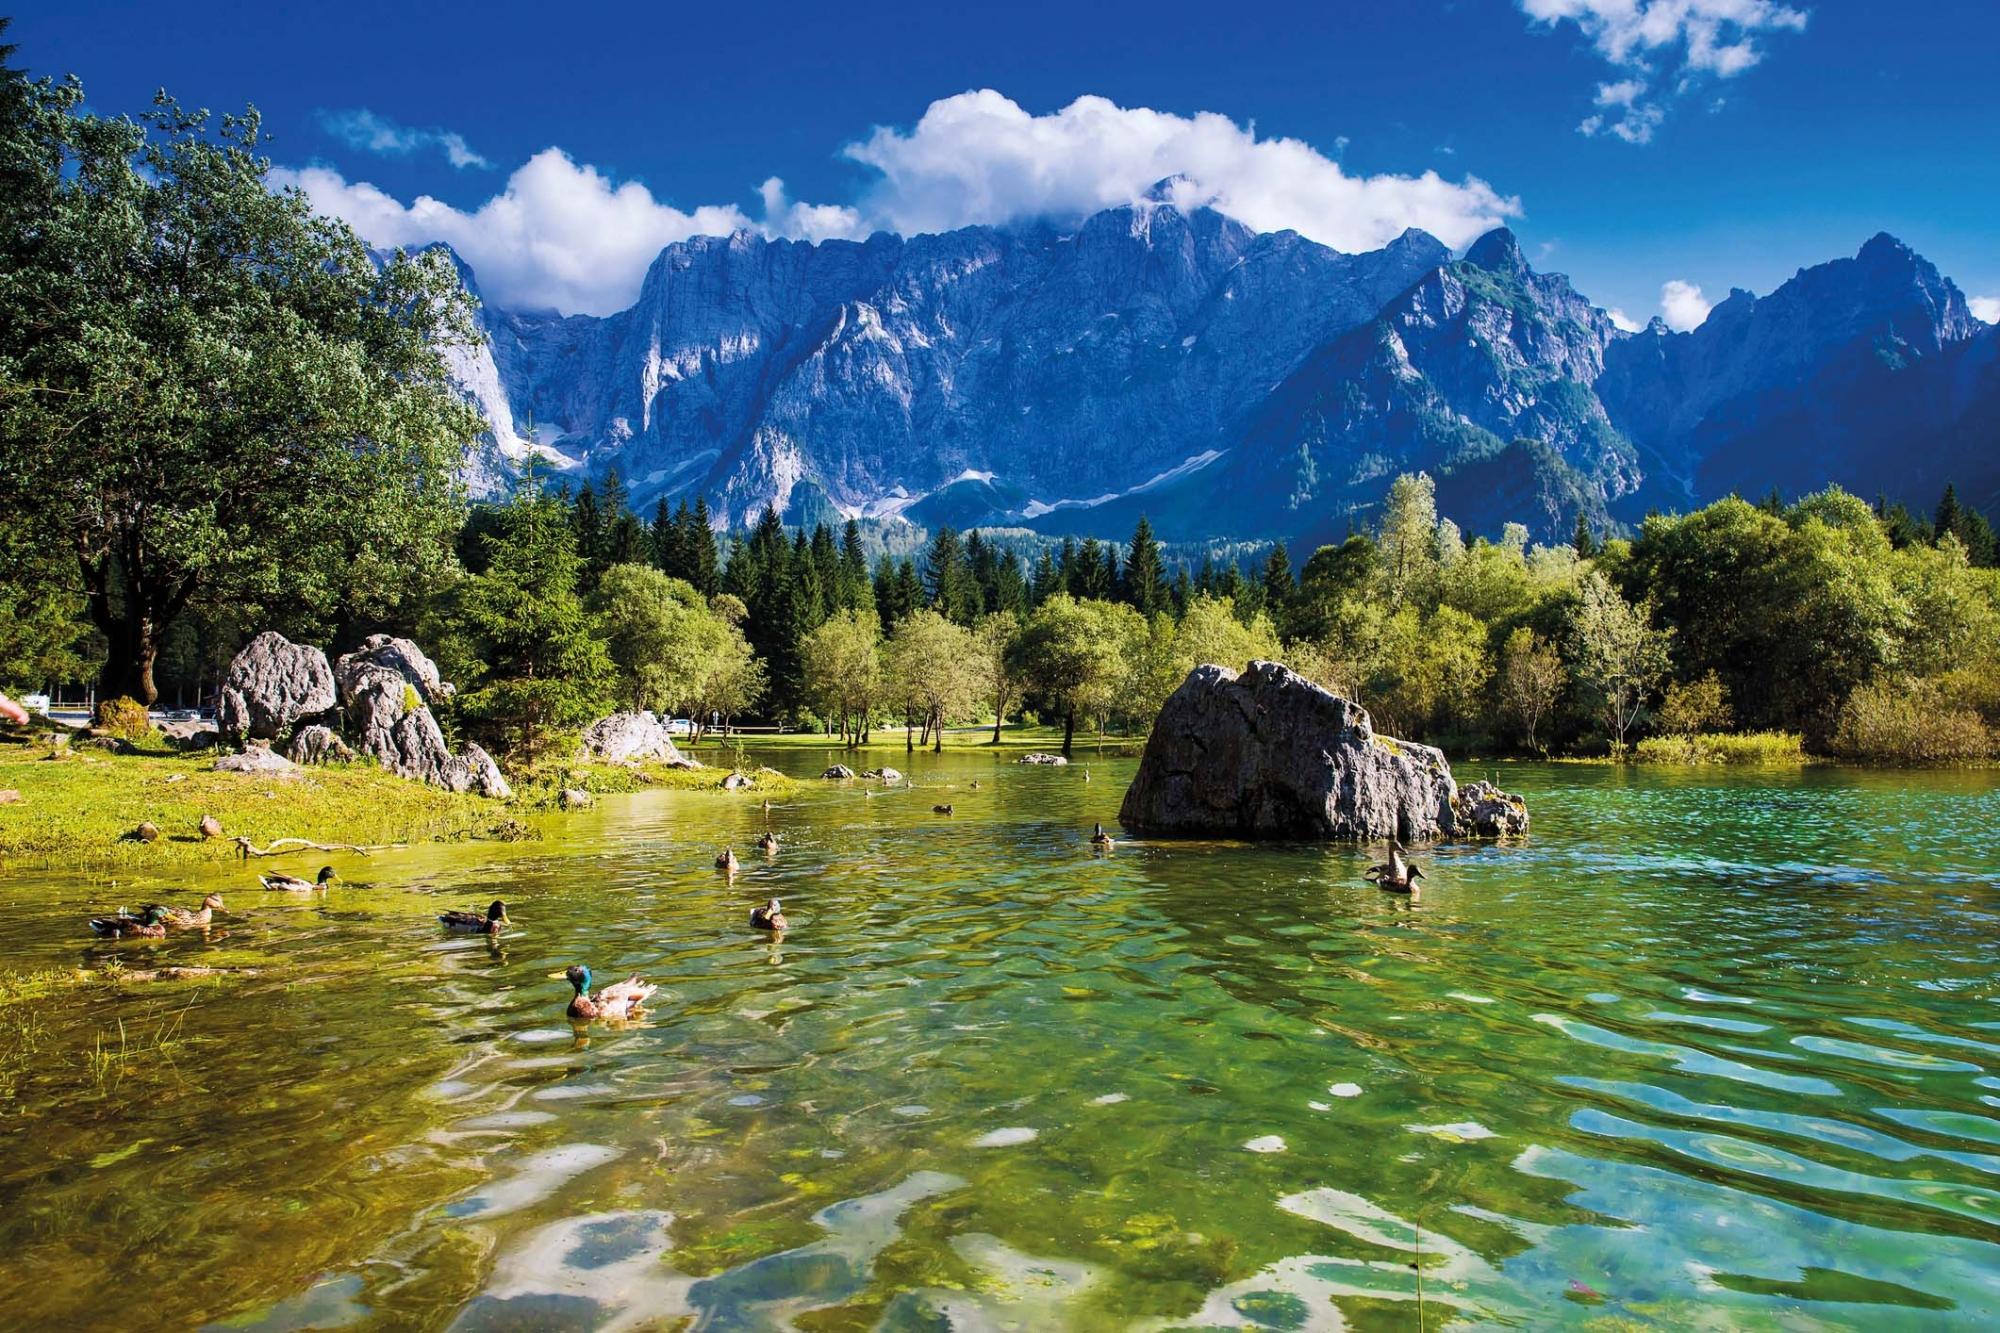 Soca Tal, Lago di Fusine, Blick auf den berg Mangart